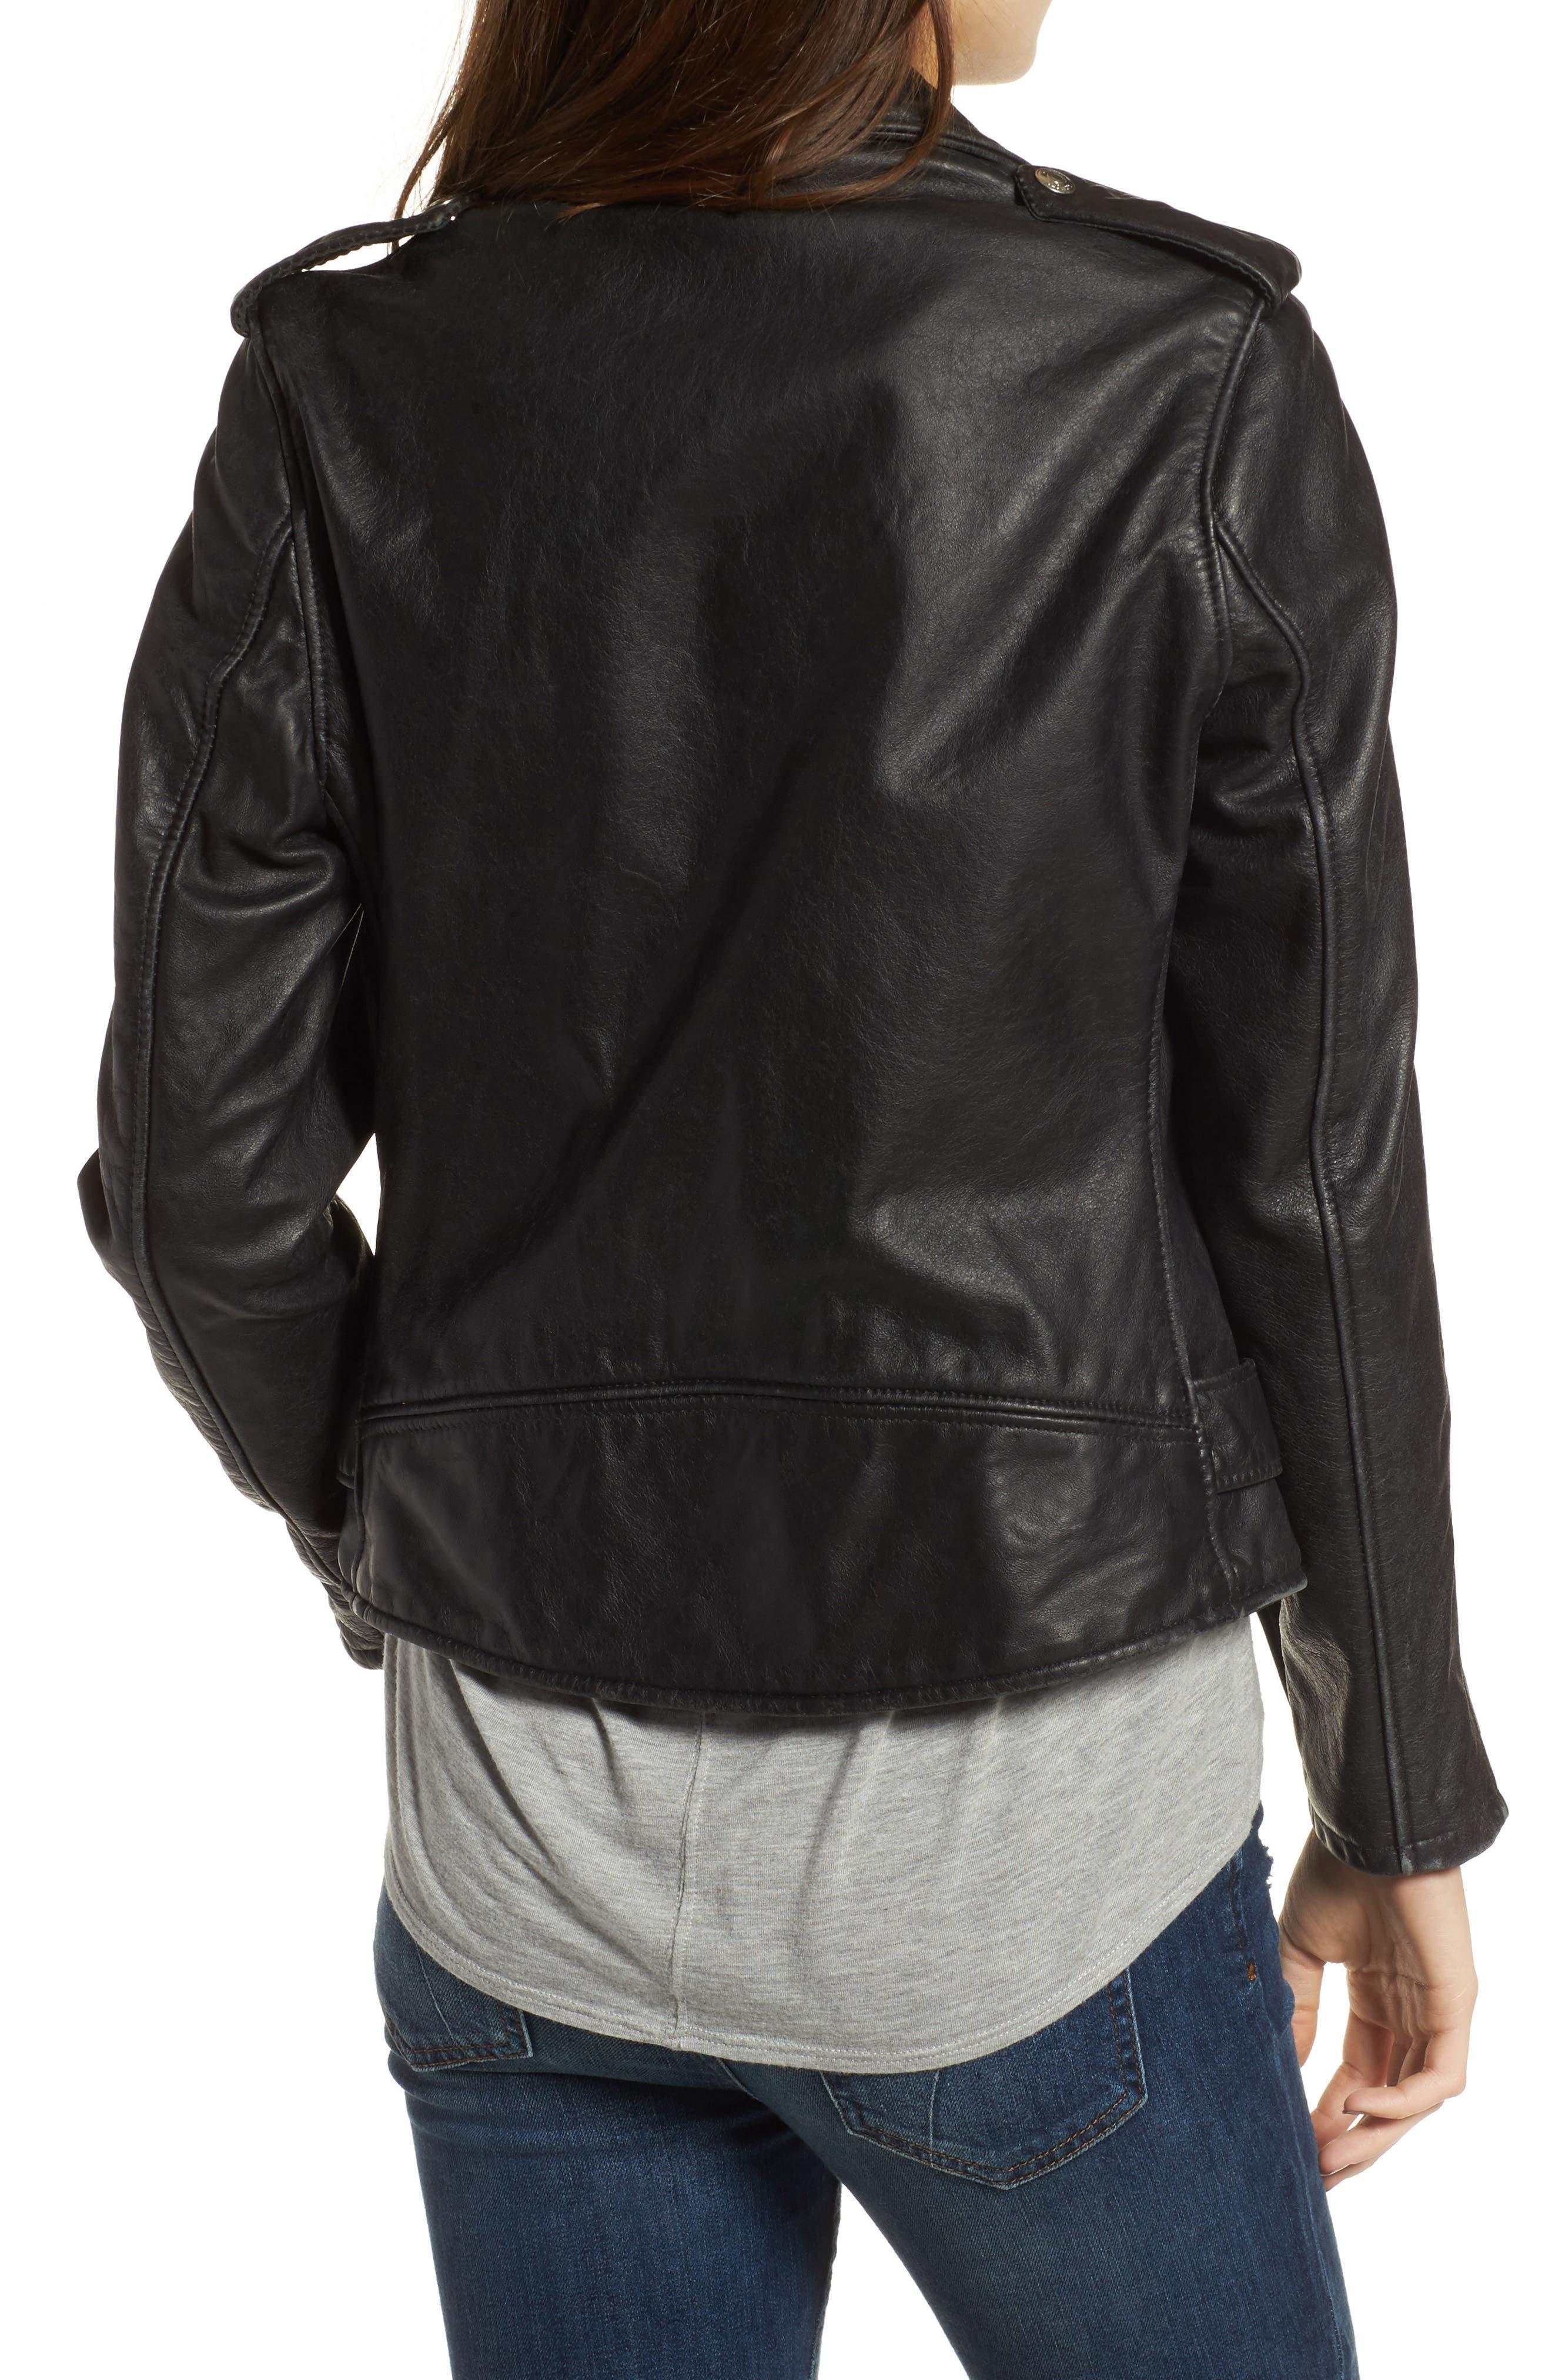 Boyfriend Leather Jacket,                             Alternate thumbnail 2, color,                             Black